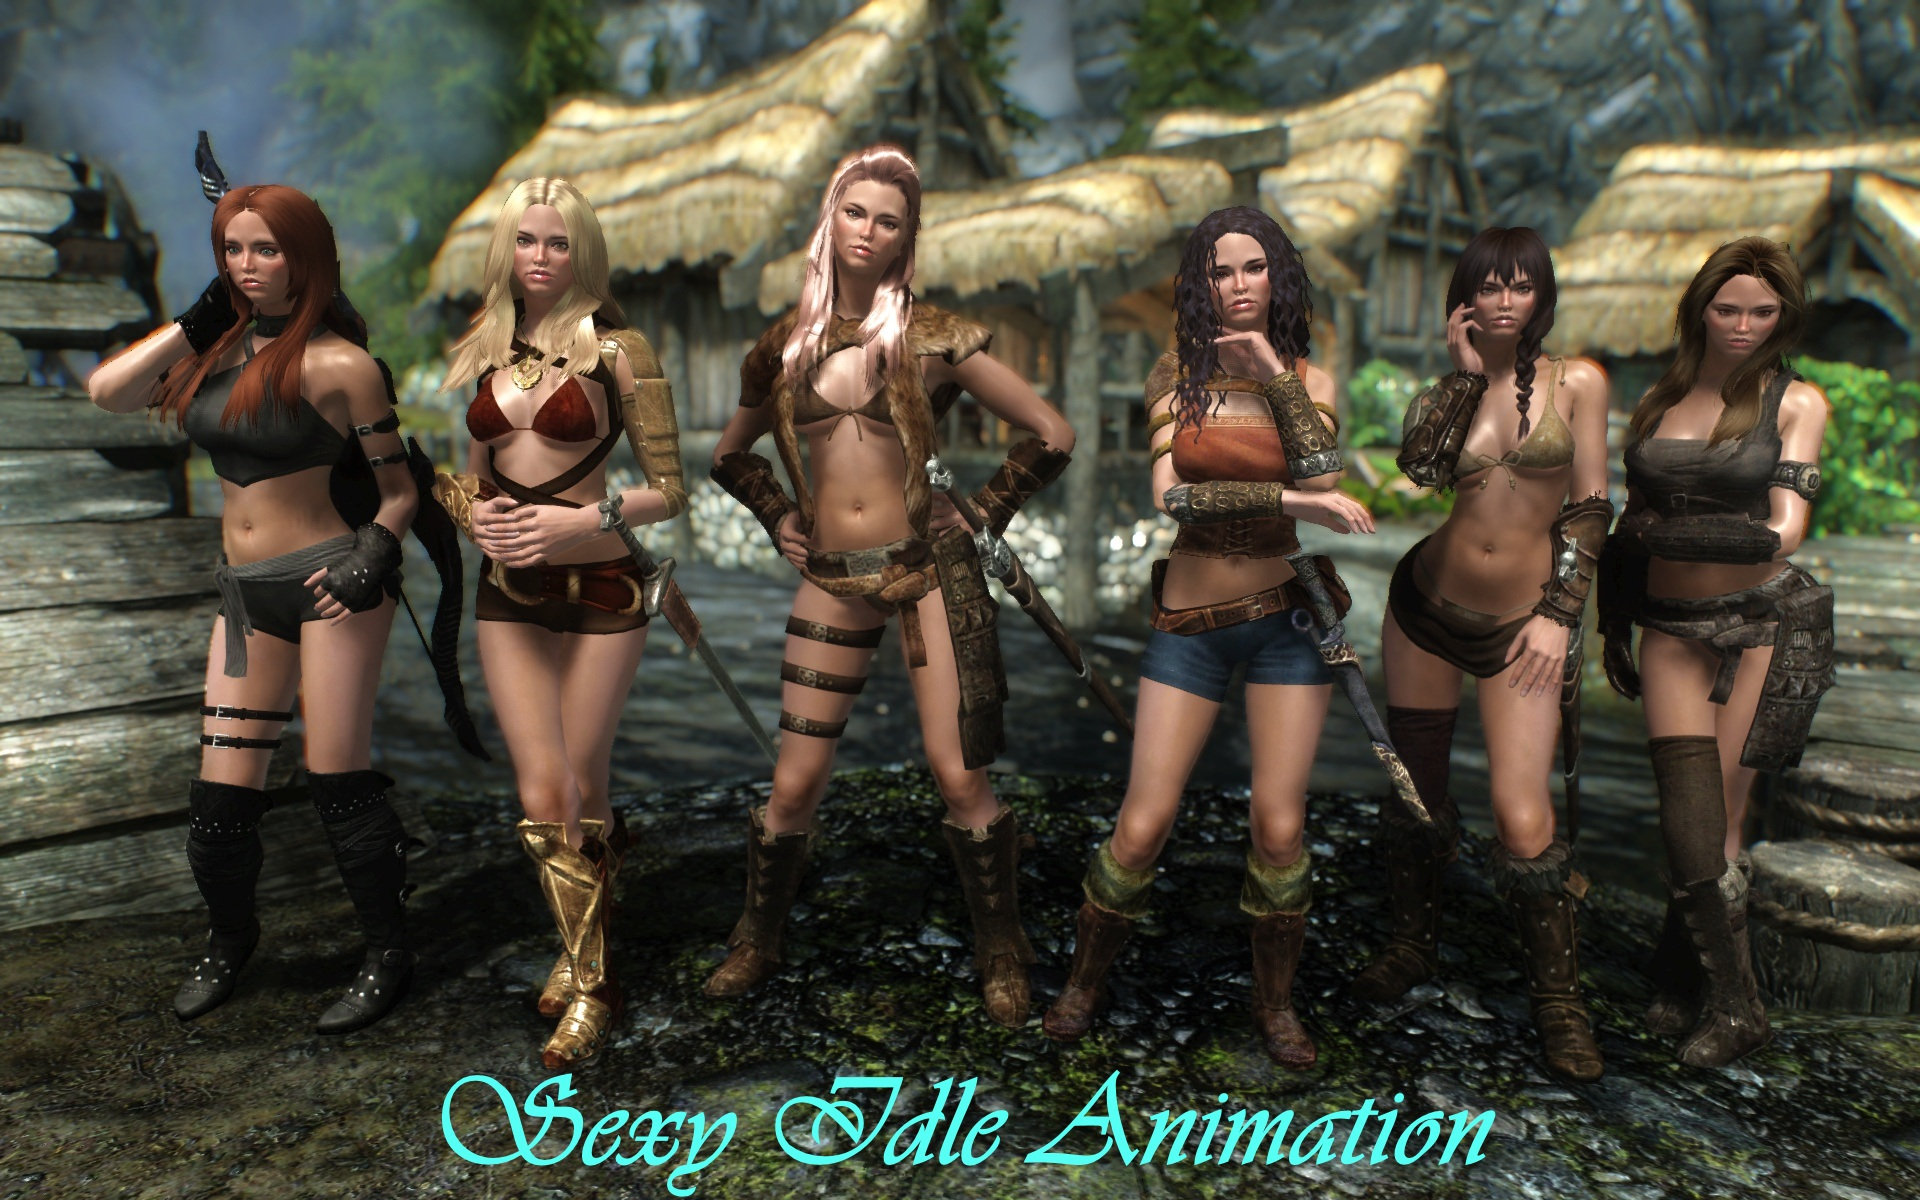 Sexy_Idle_Animation.jpg